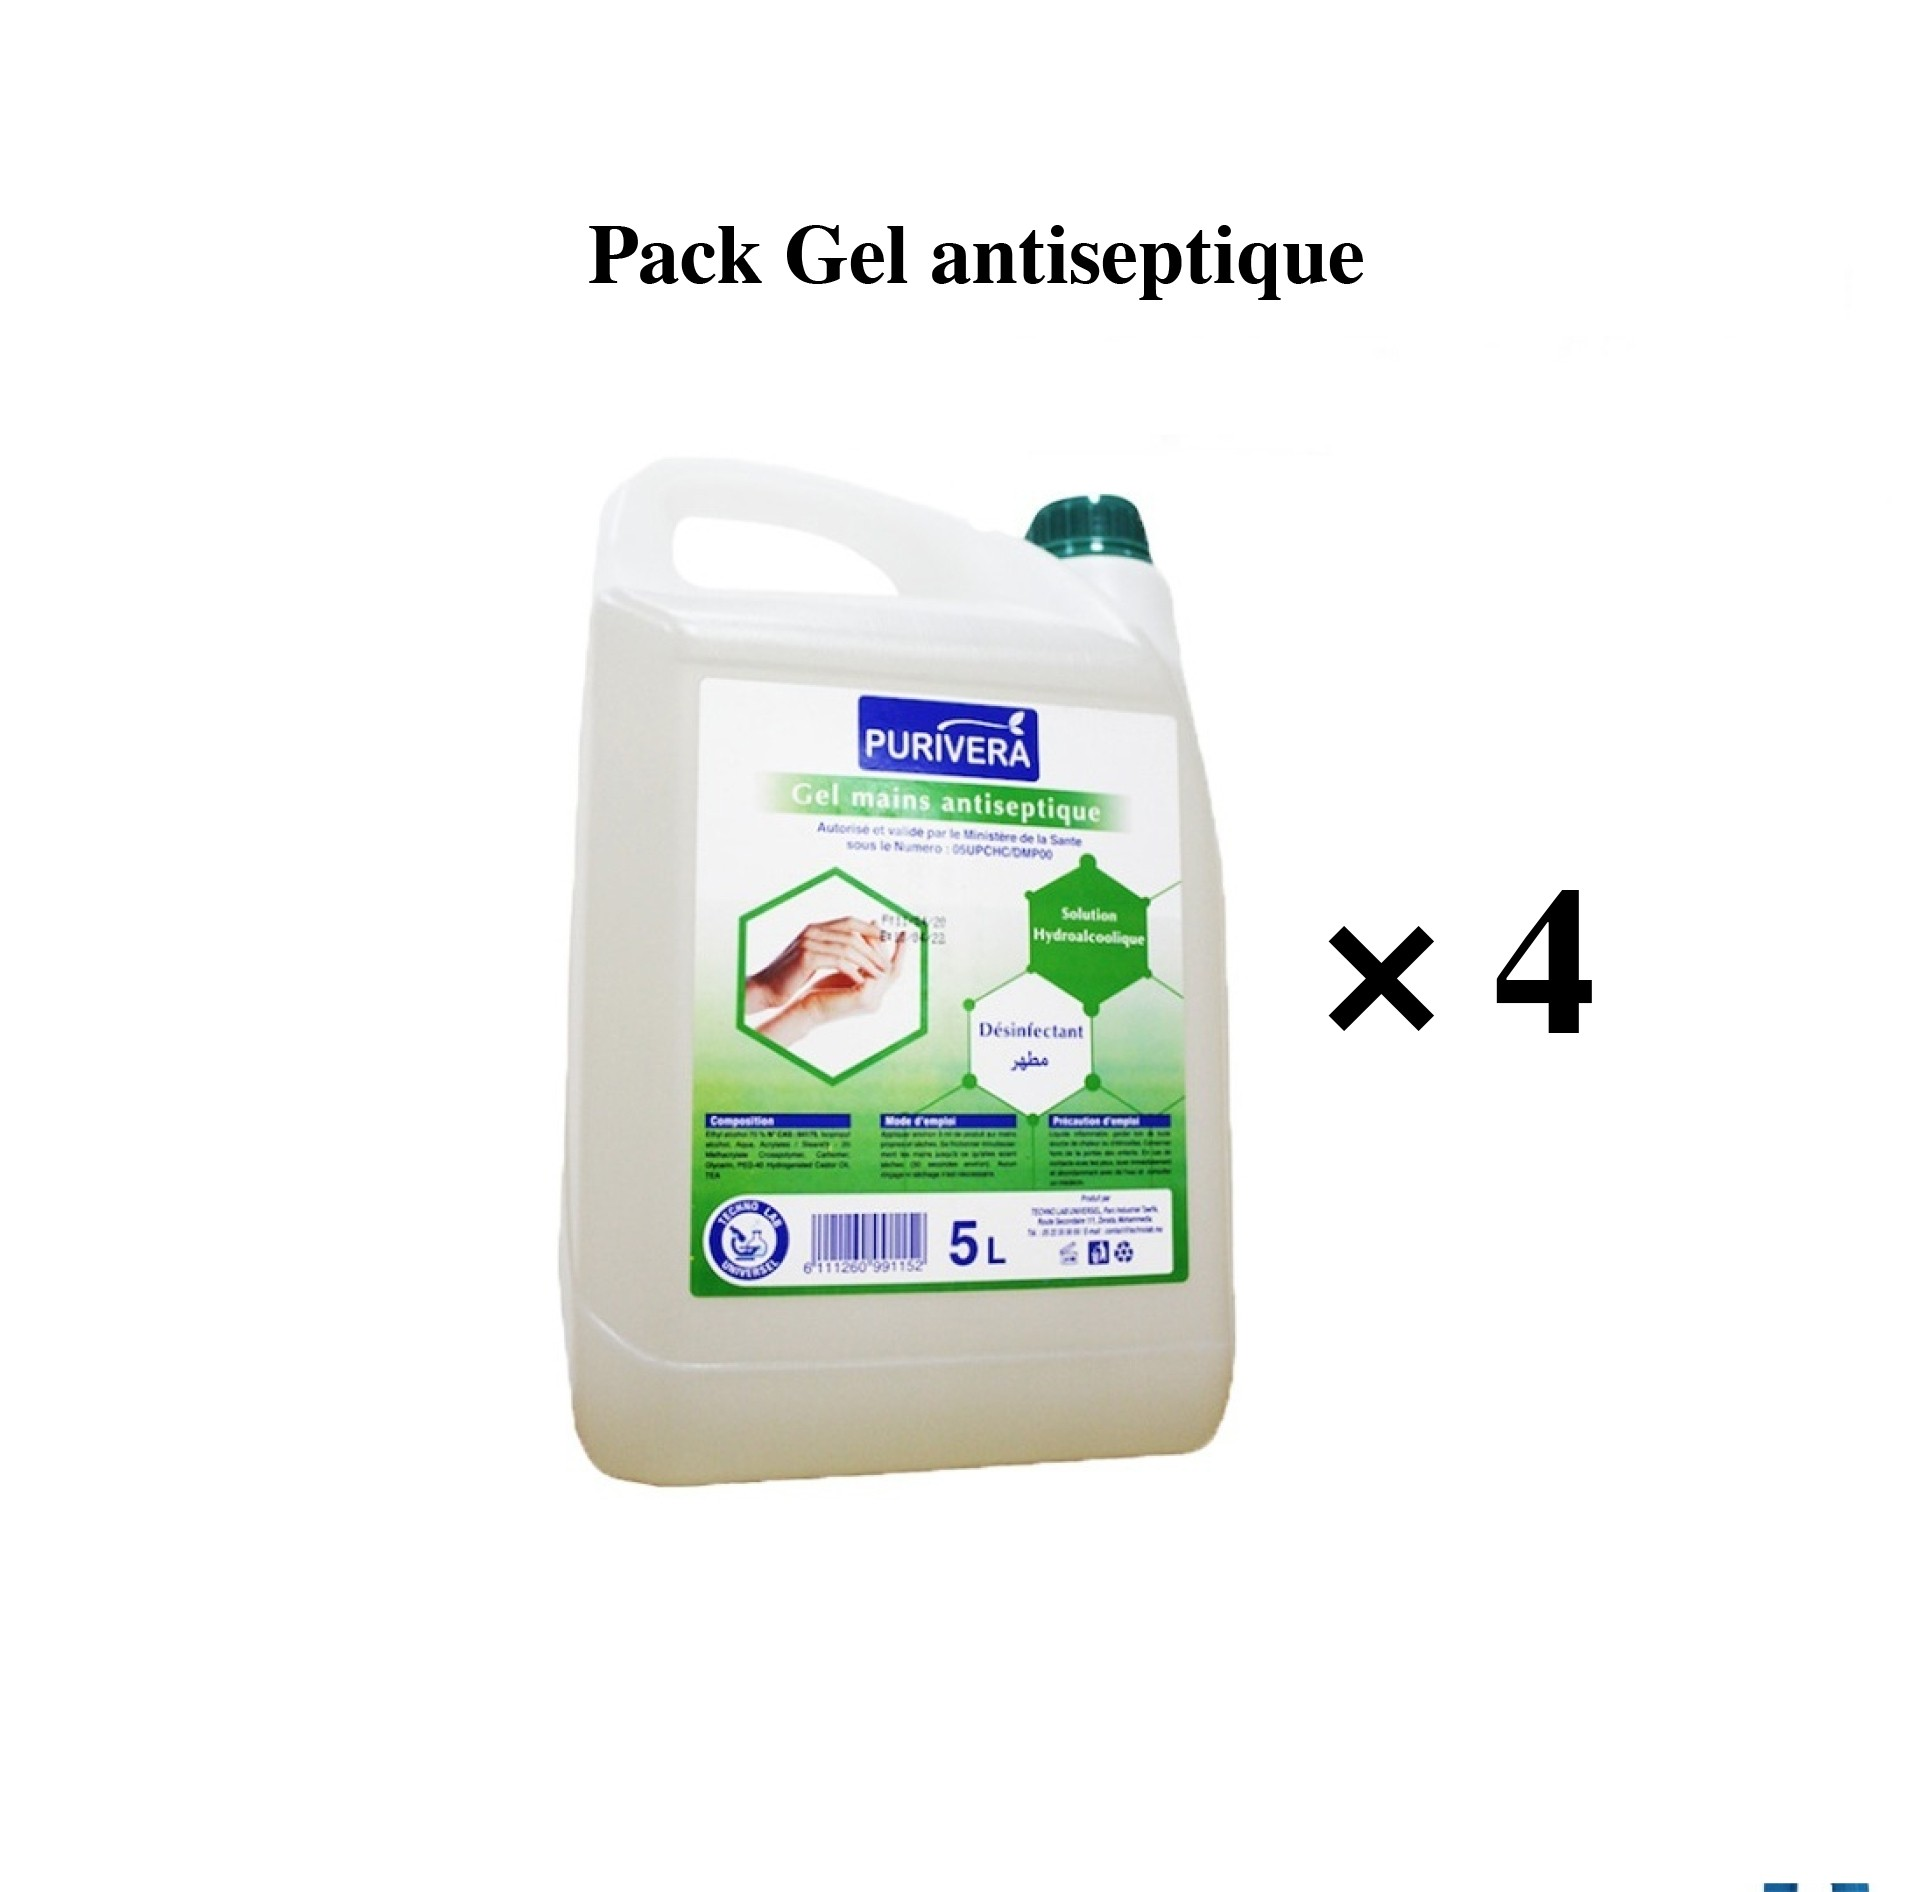 4 Bidons Gel Desinfectant Main 5l Pas Cher Sanili Maroc